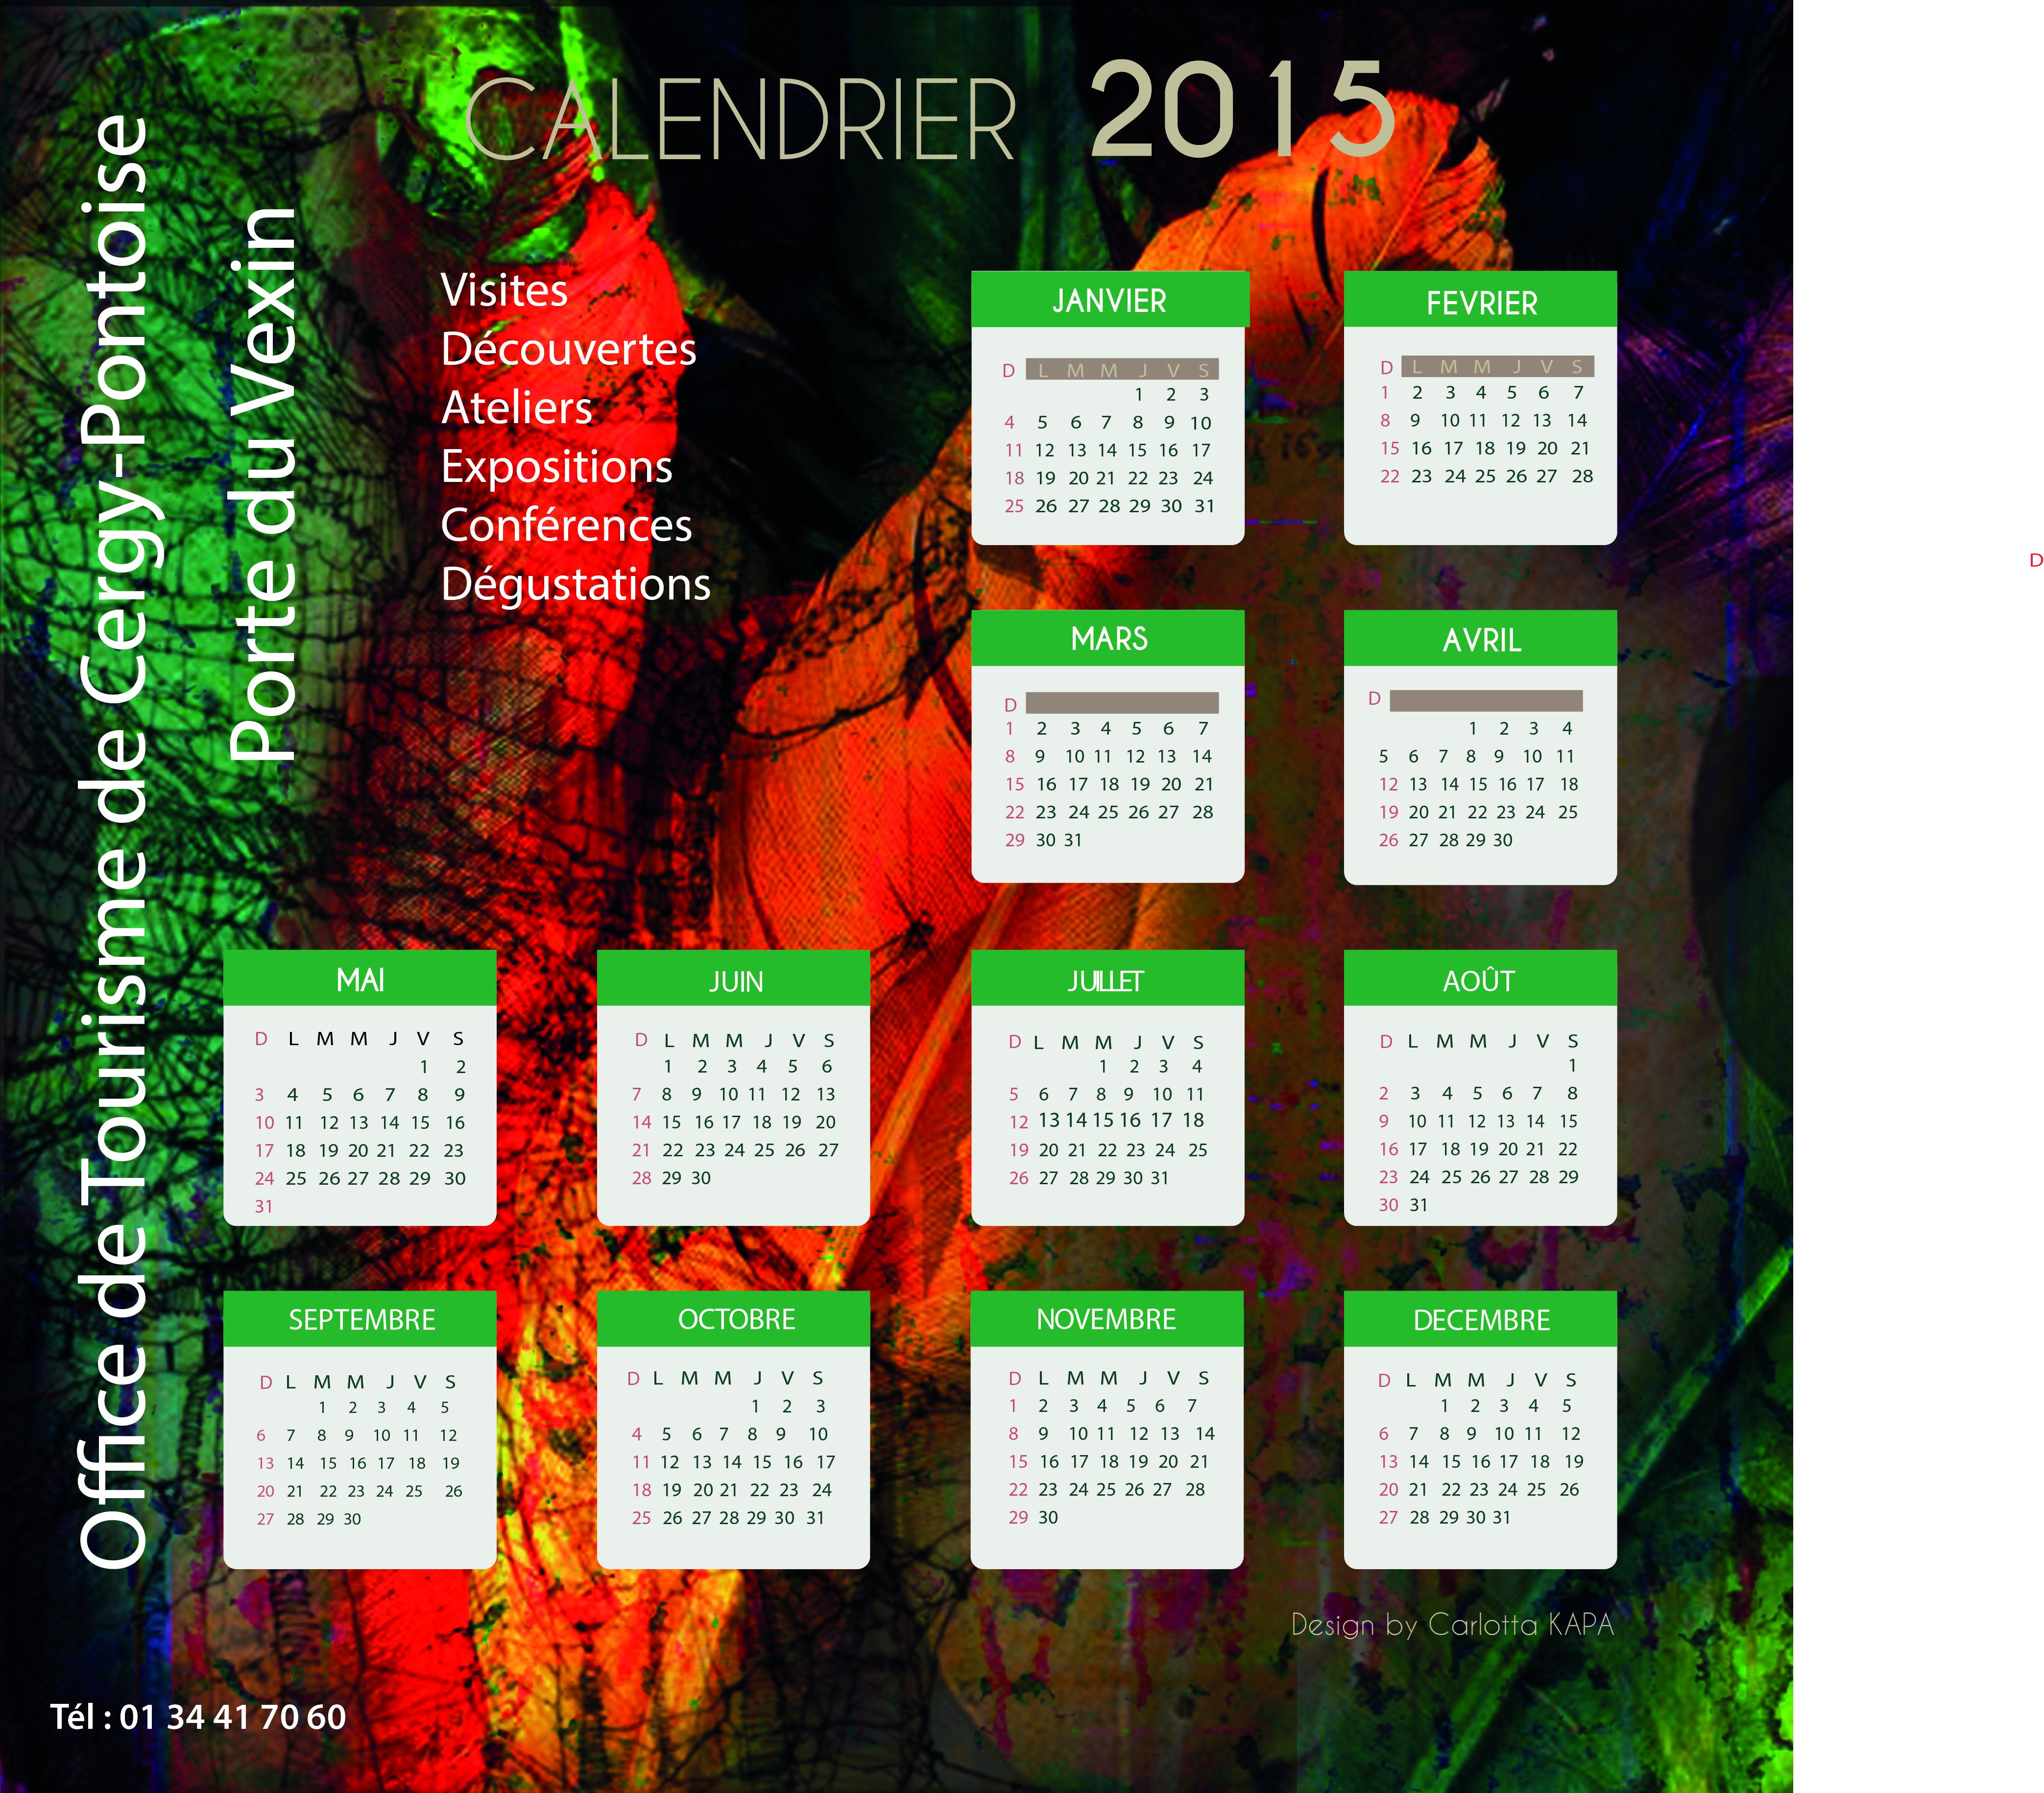 Calendrier 2015 - gabarit 2 300 x300  fini